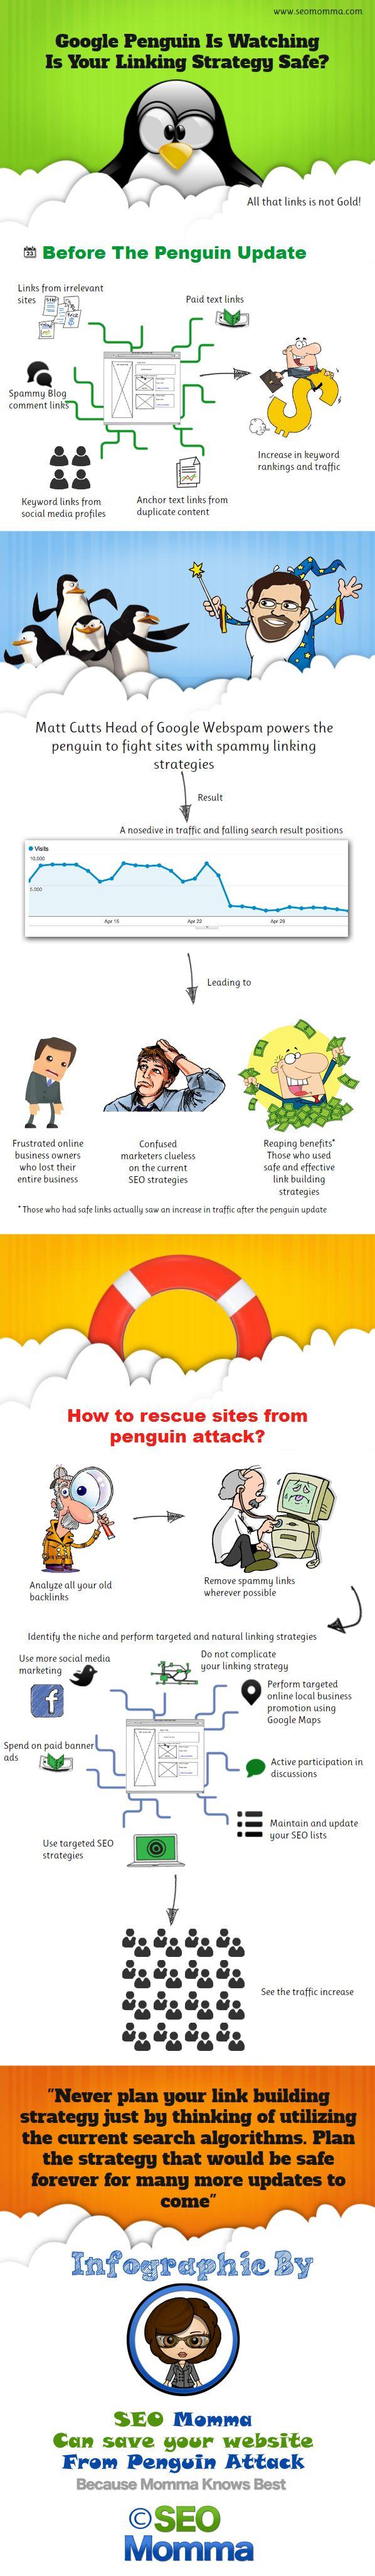 Google Penguin Update Explained